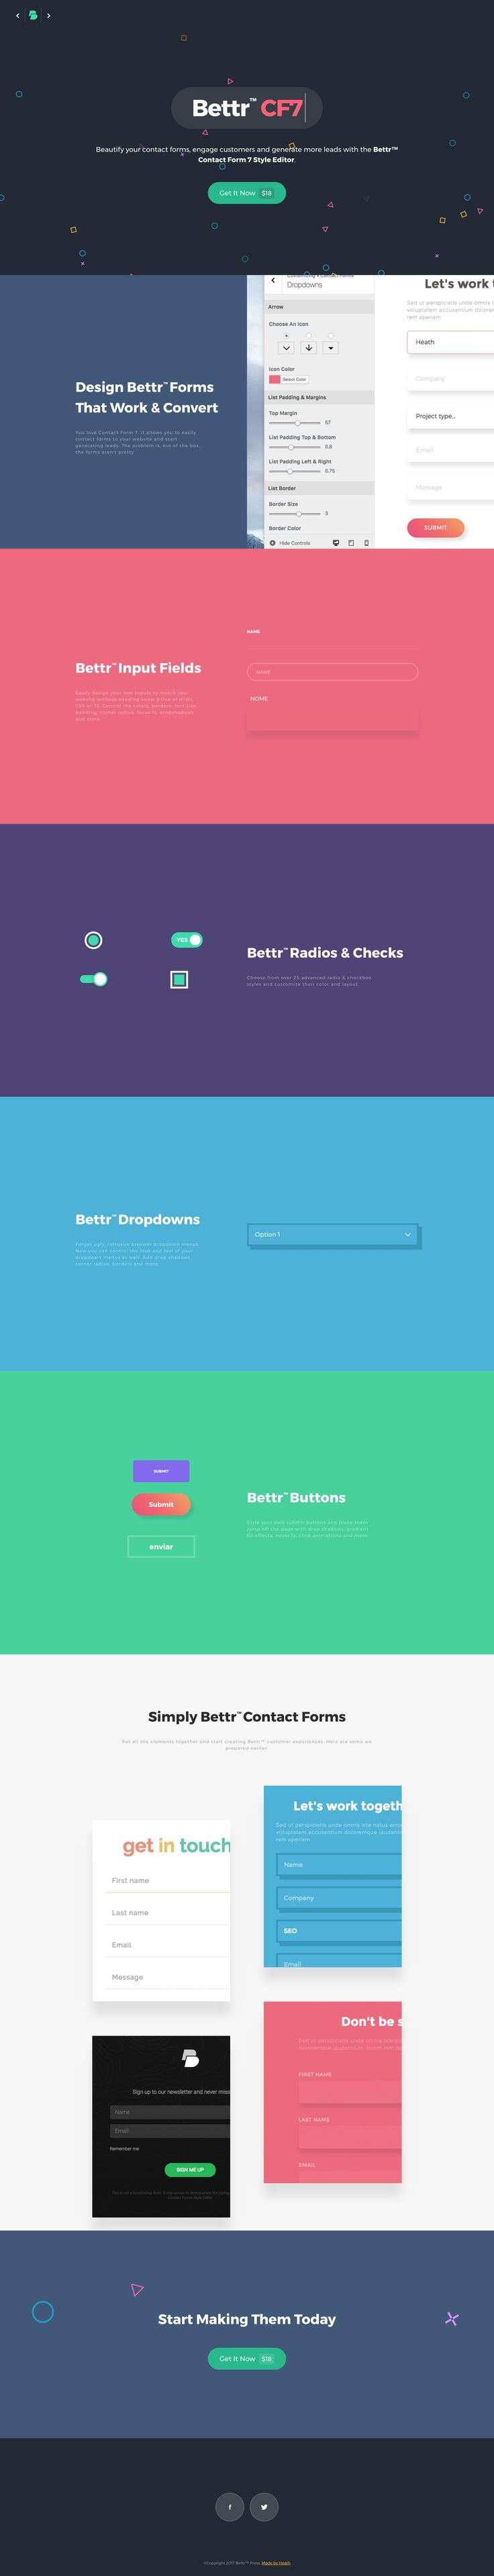 Shirt design wordpress plugin - Colorful Landing Page Promoting Bettr Cf7 A Premium Add On To Beautify